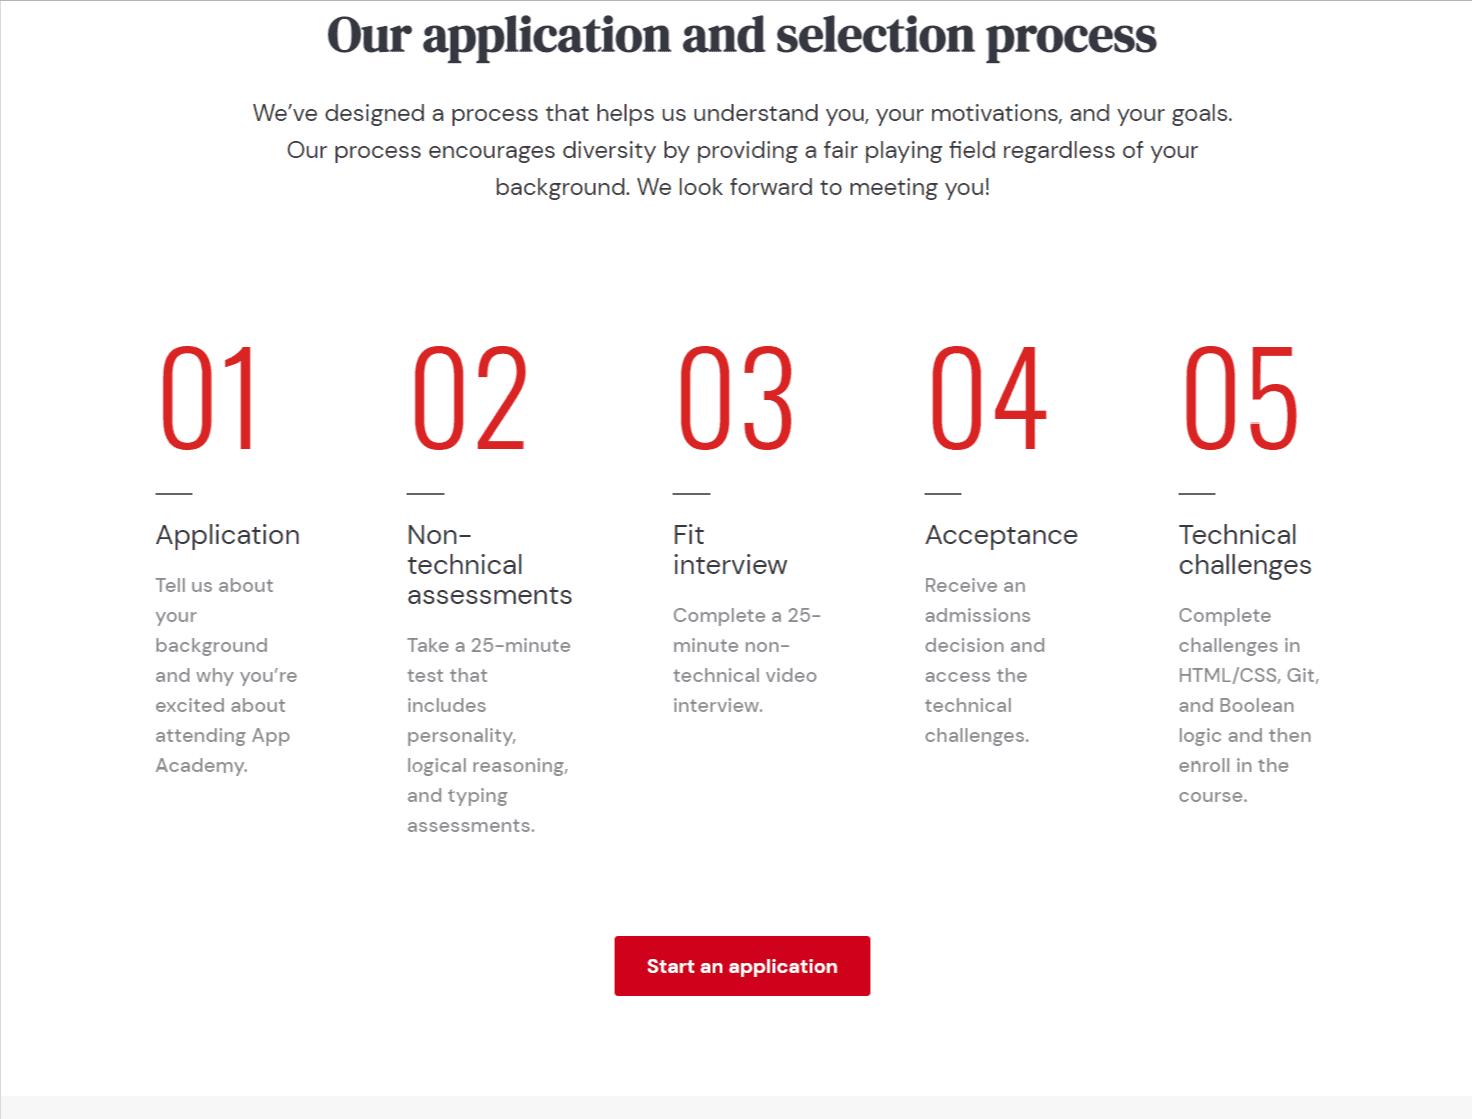 Selection and Application process- Lambda school vs App Academy